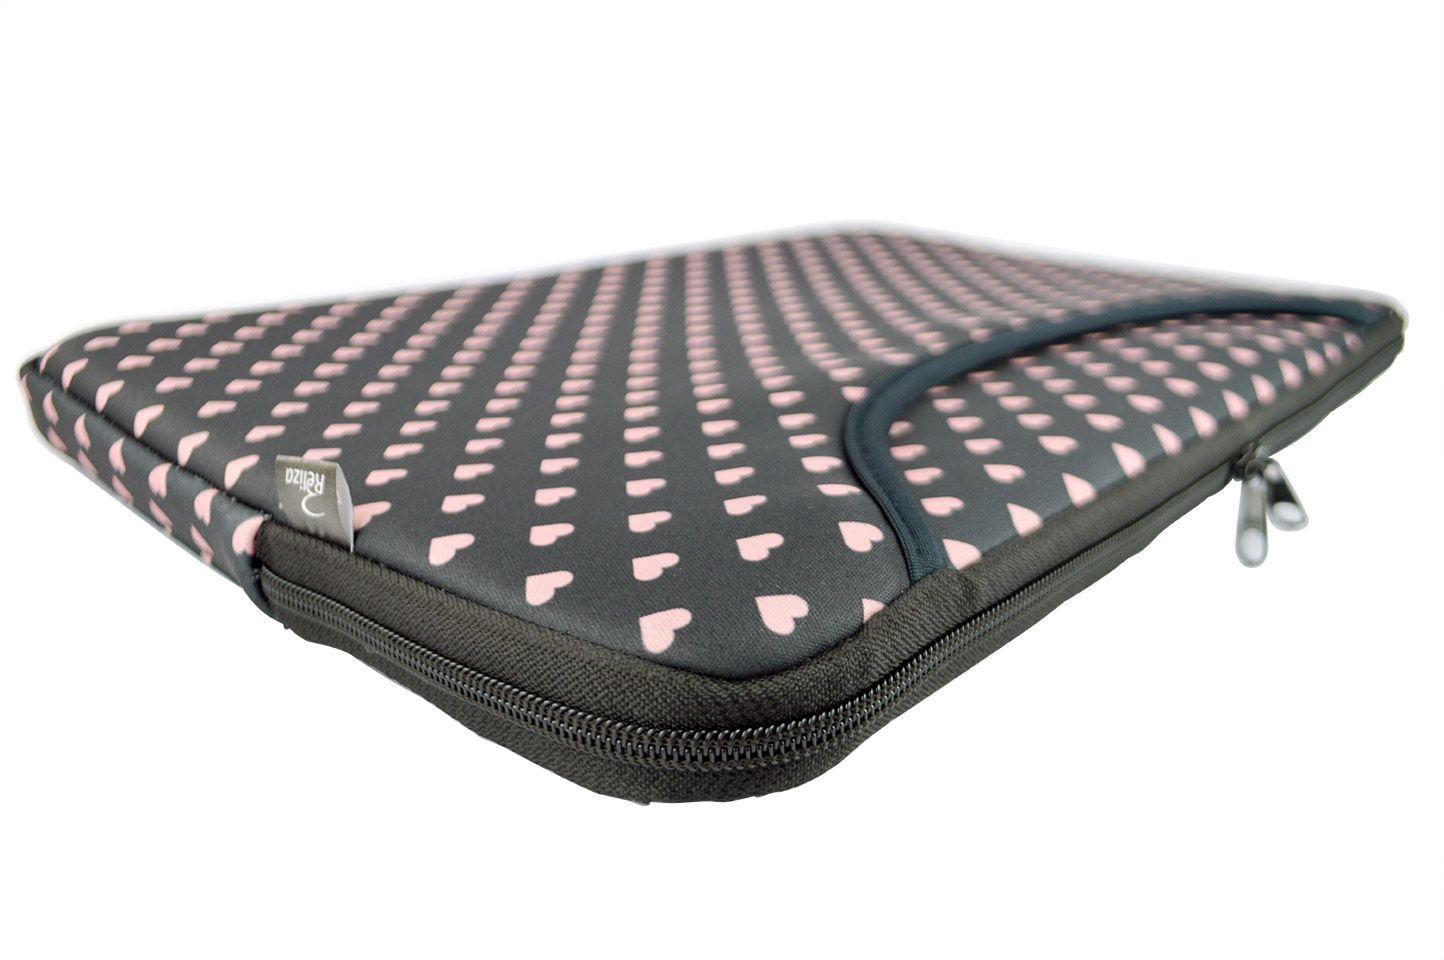 Capa Case para Notebook 14 com Bolso Frontal - Love Chocolate